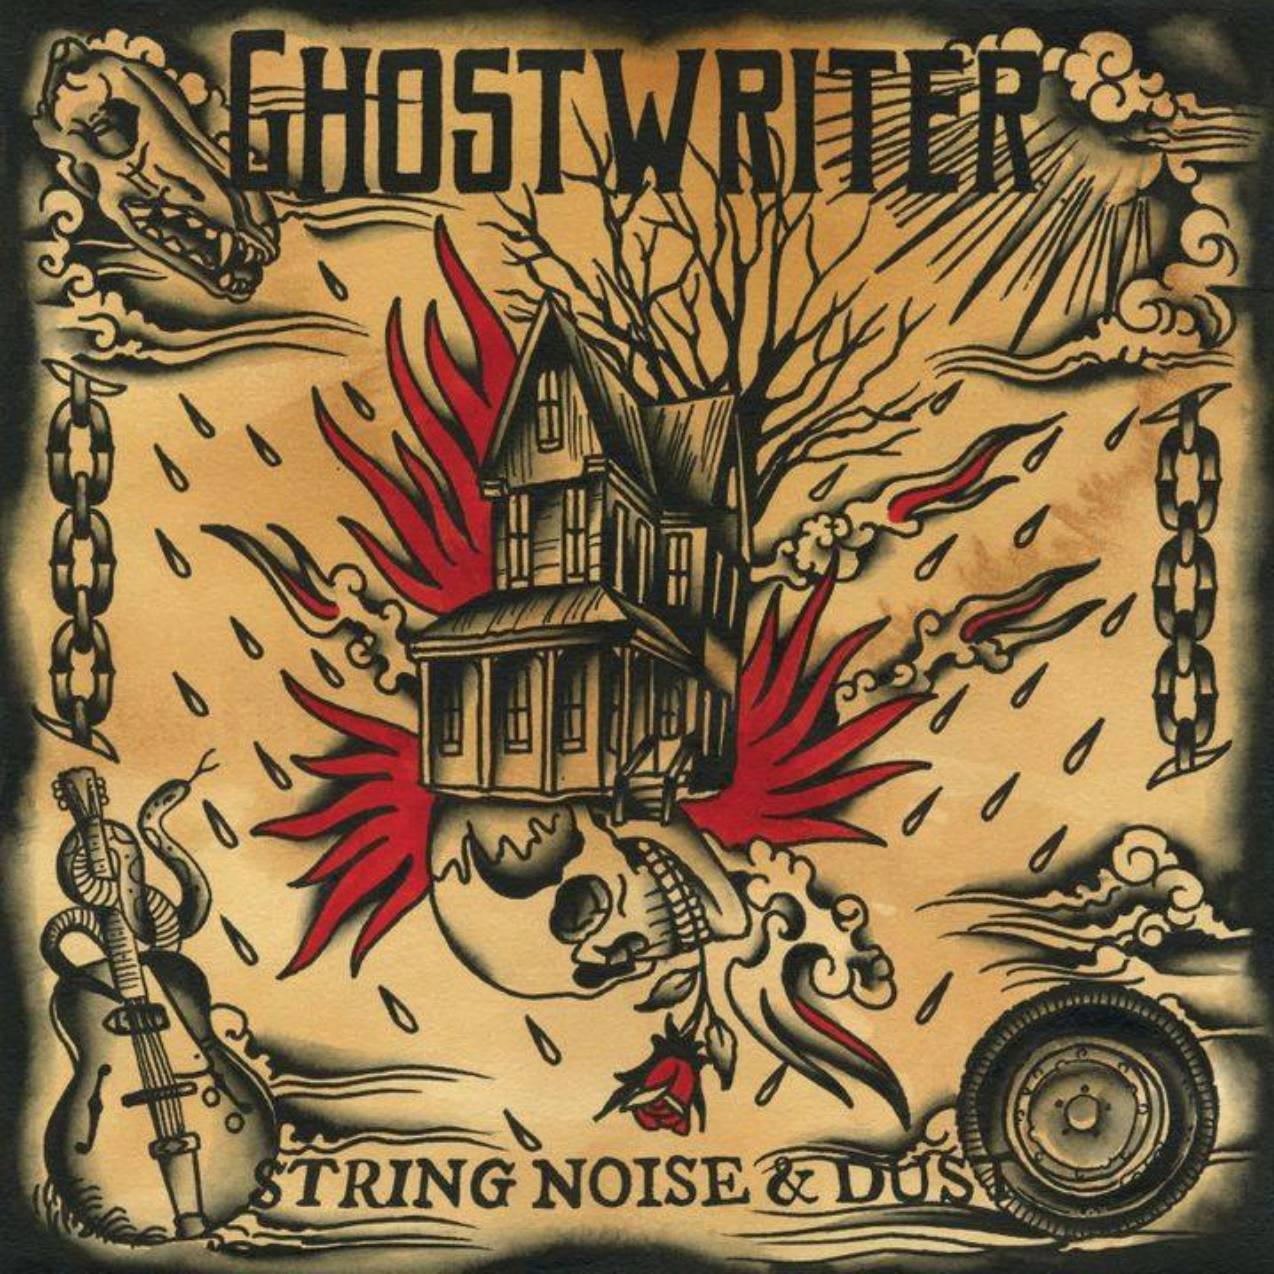 Ghostwriter at Buzz Mill